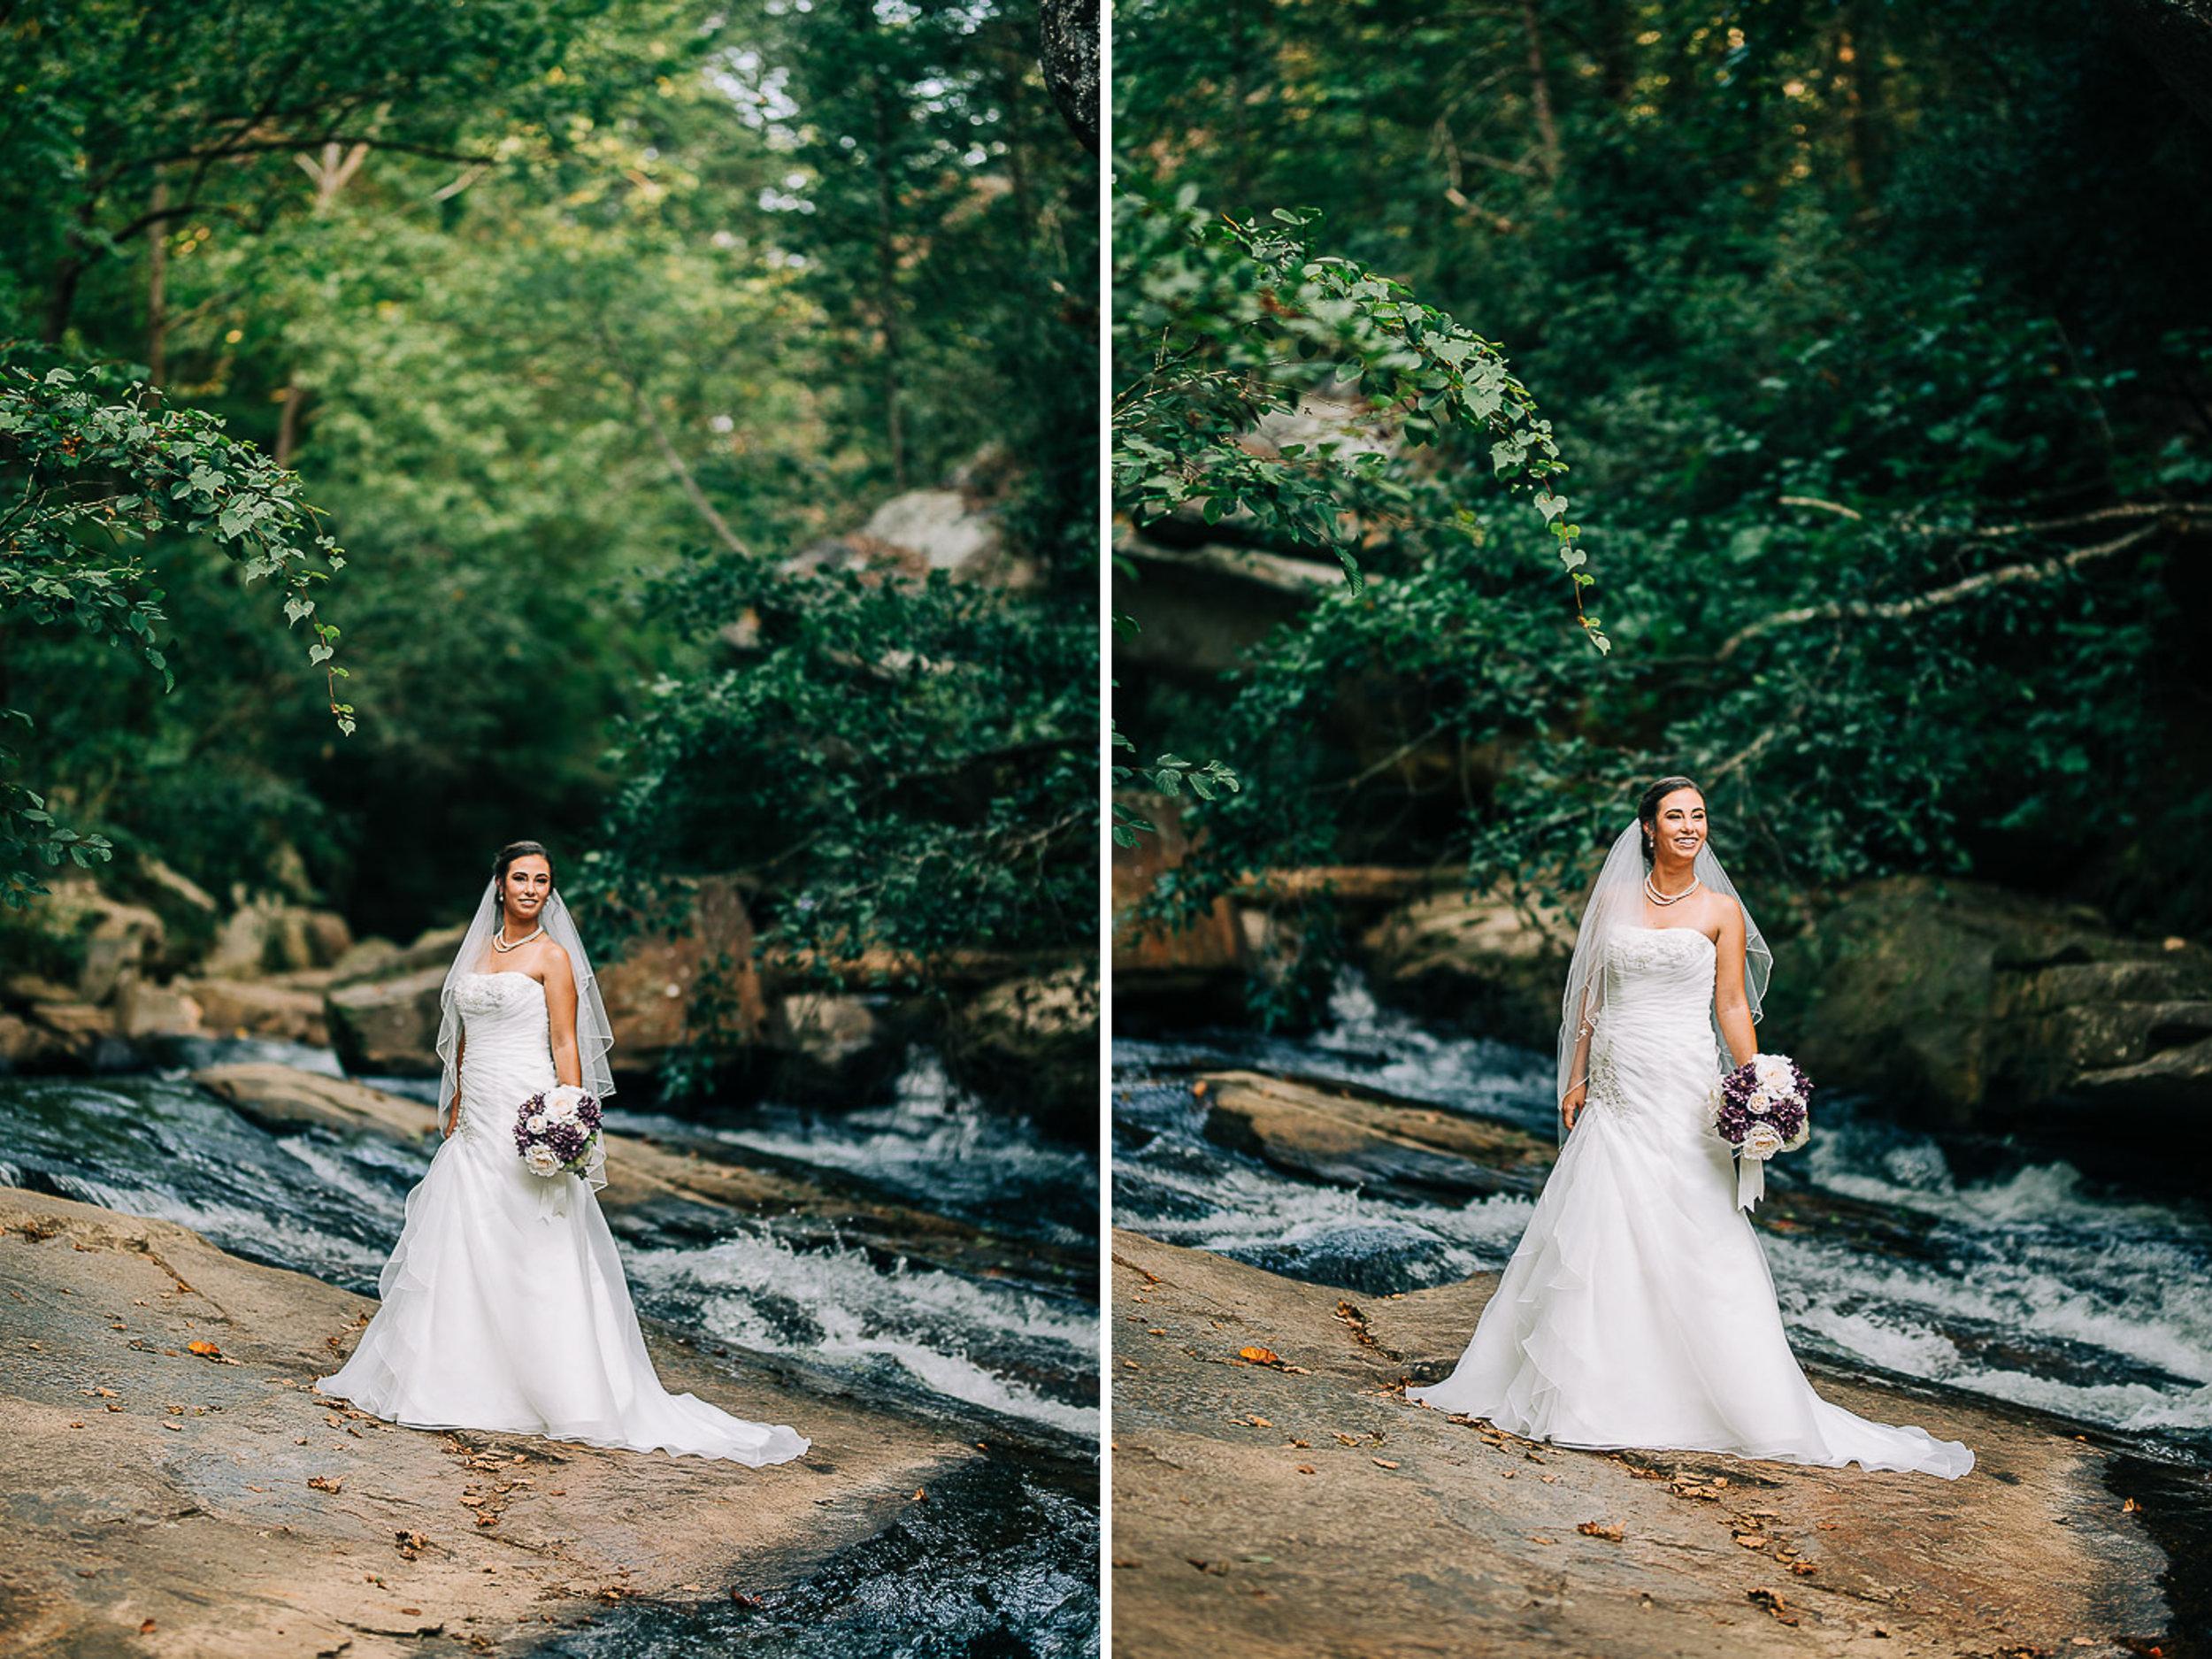 River Bridal Portraits, South Carolina Wedding Photographer, 01.jpg